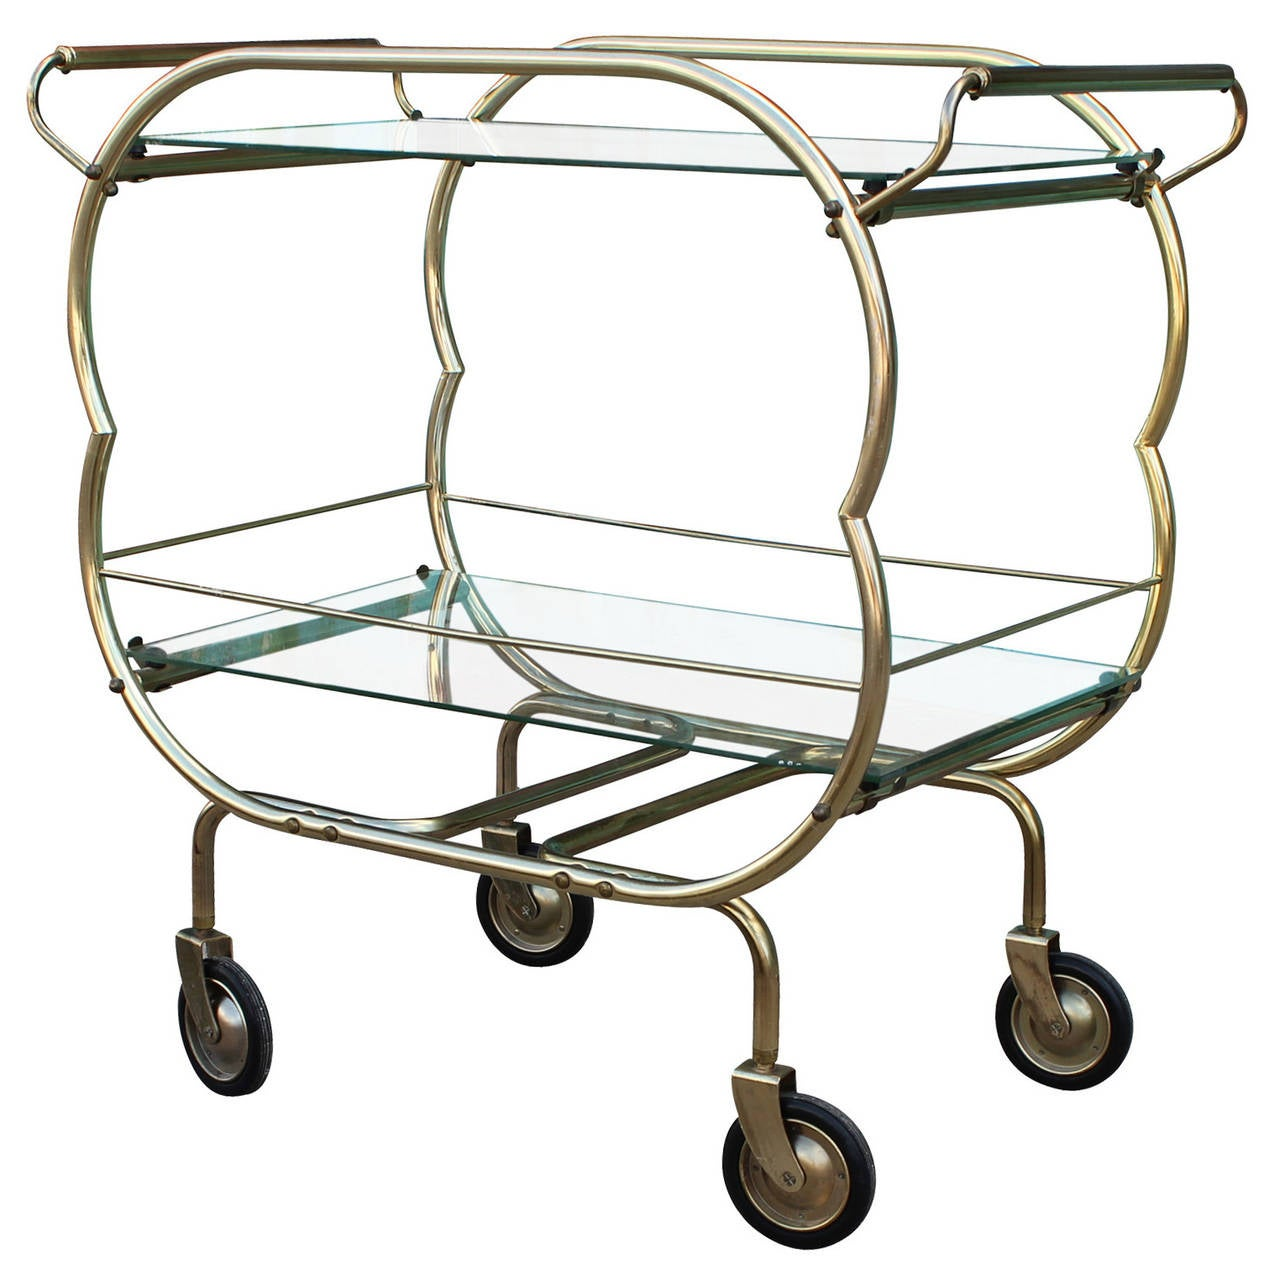 Brass and glass bar cart at 1stdibs